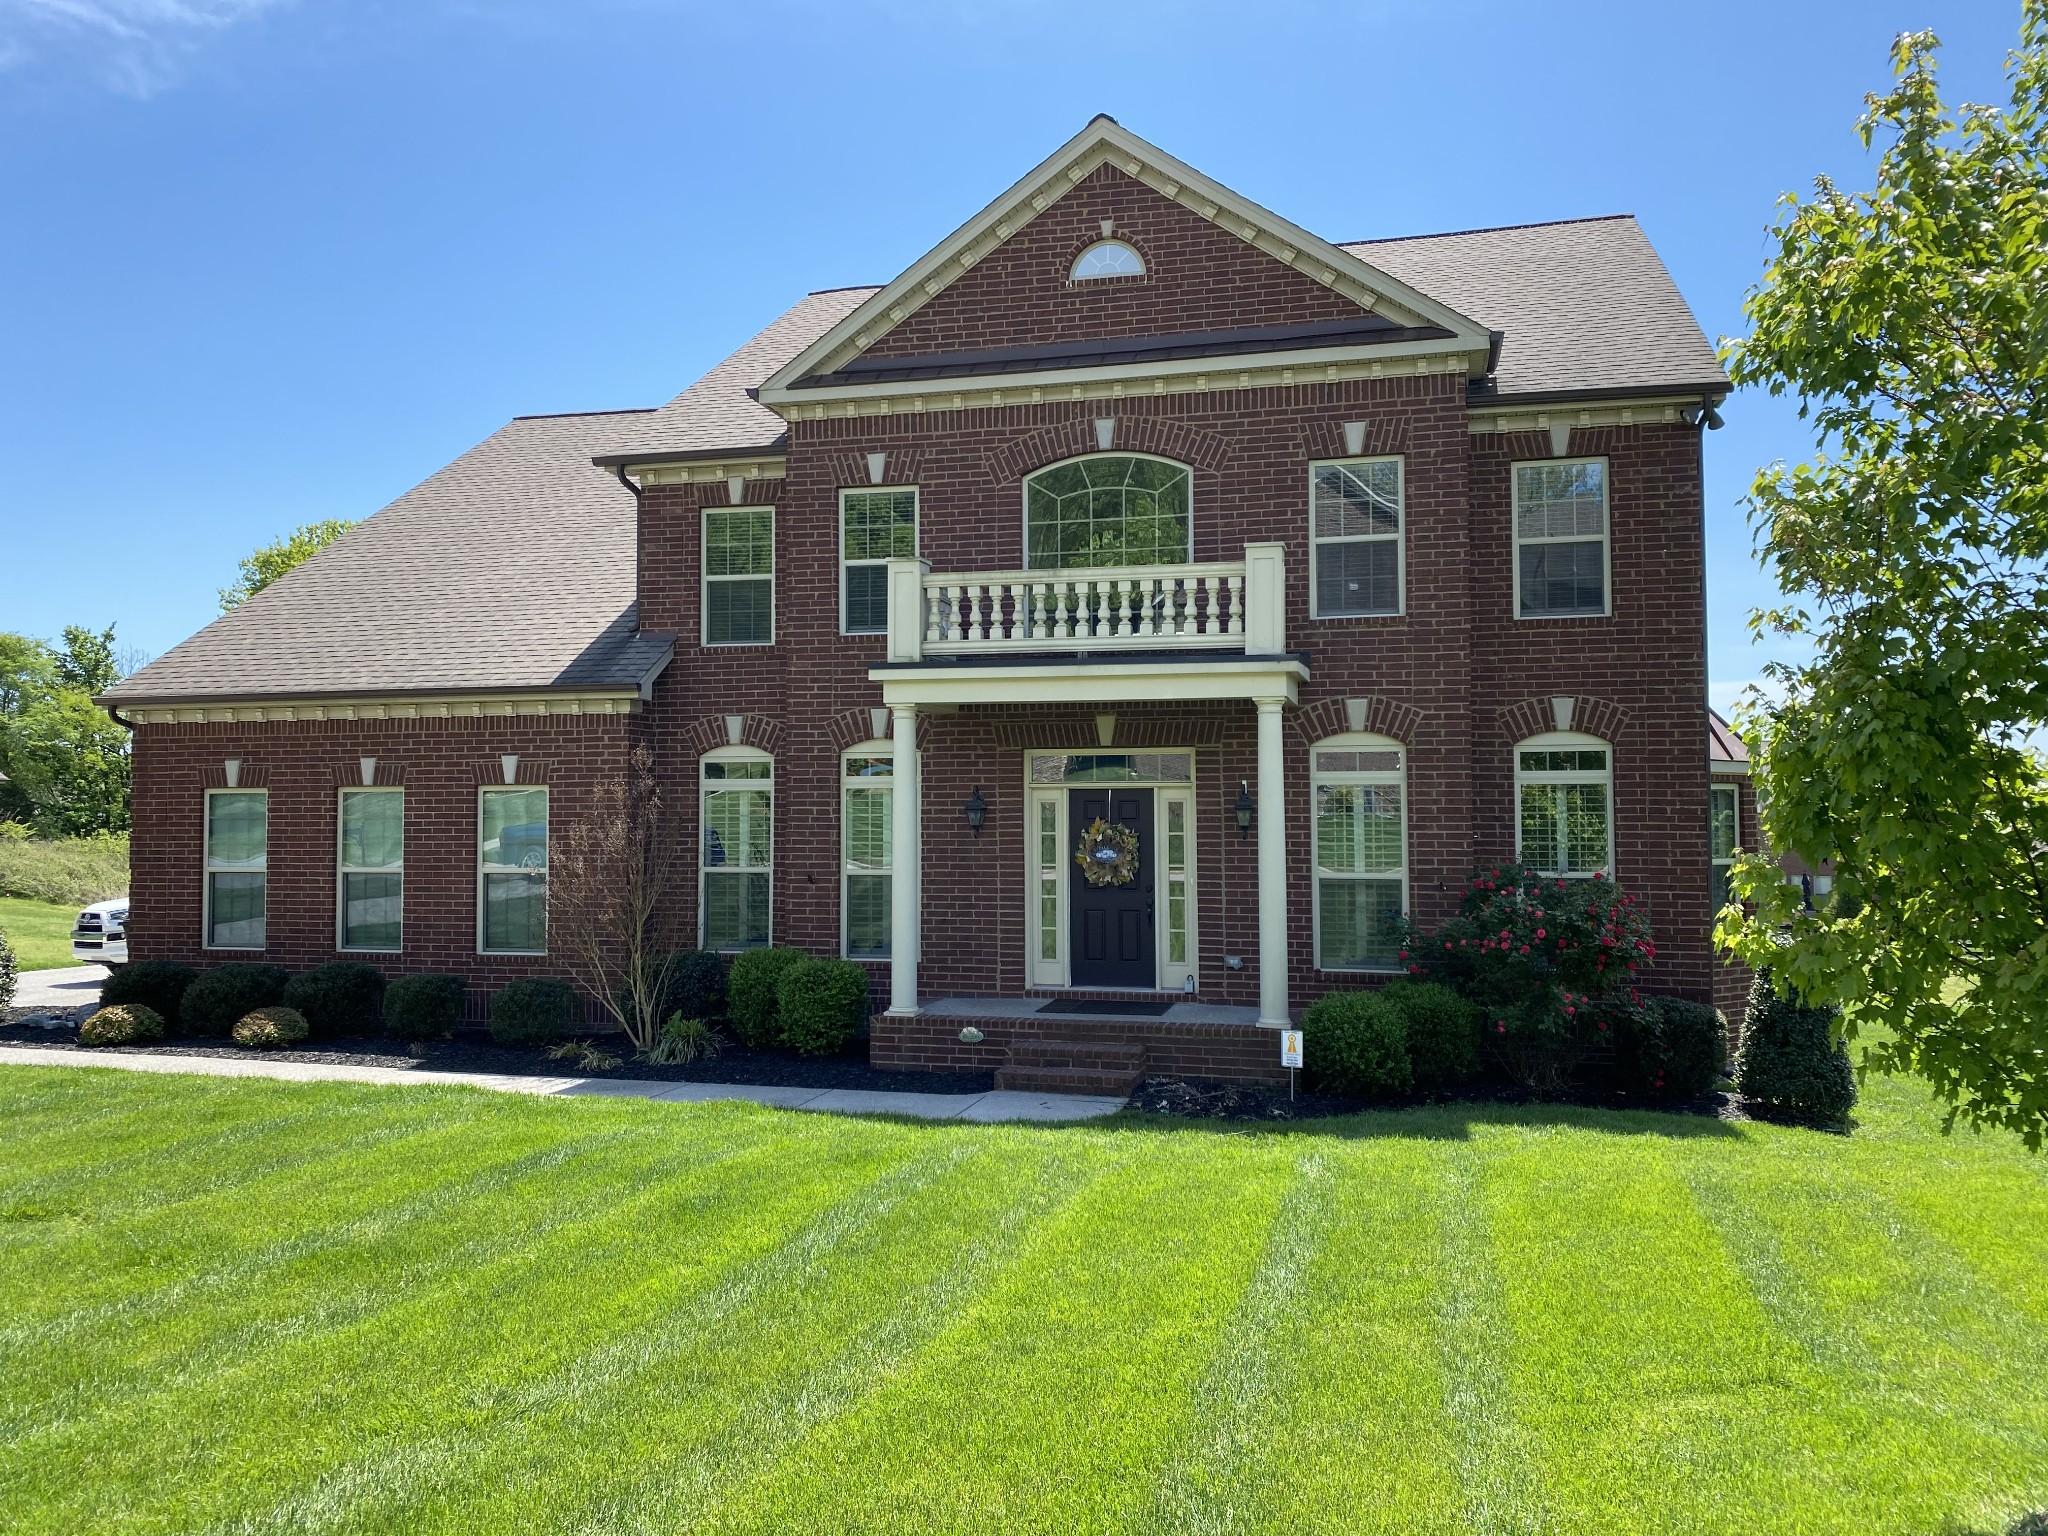 6901 Guffee Ter, College Grove, TN 37046 - College Grove, TN real estate listing